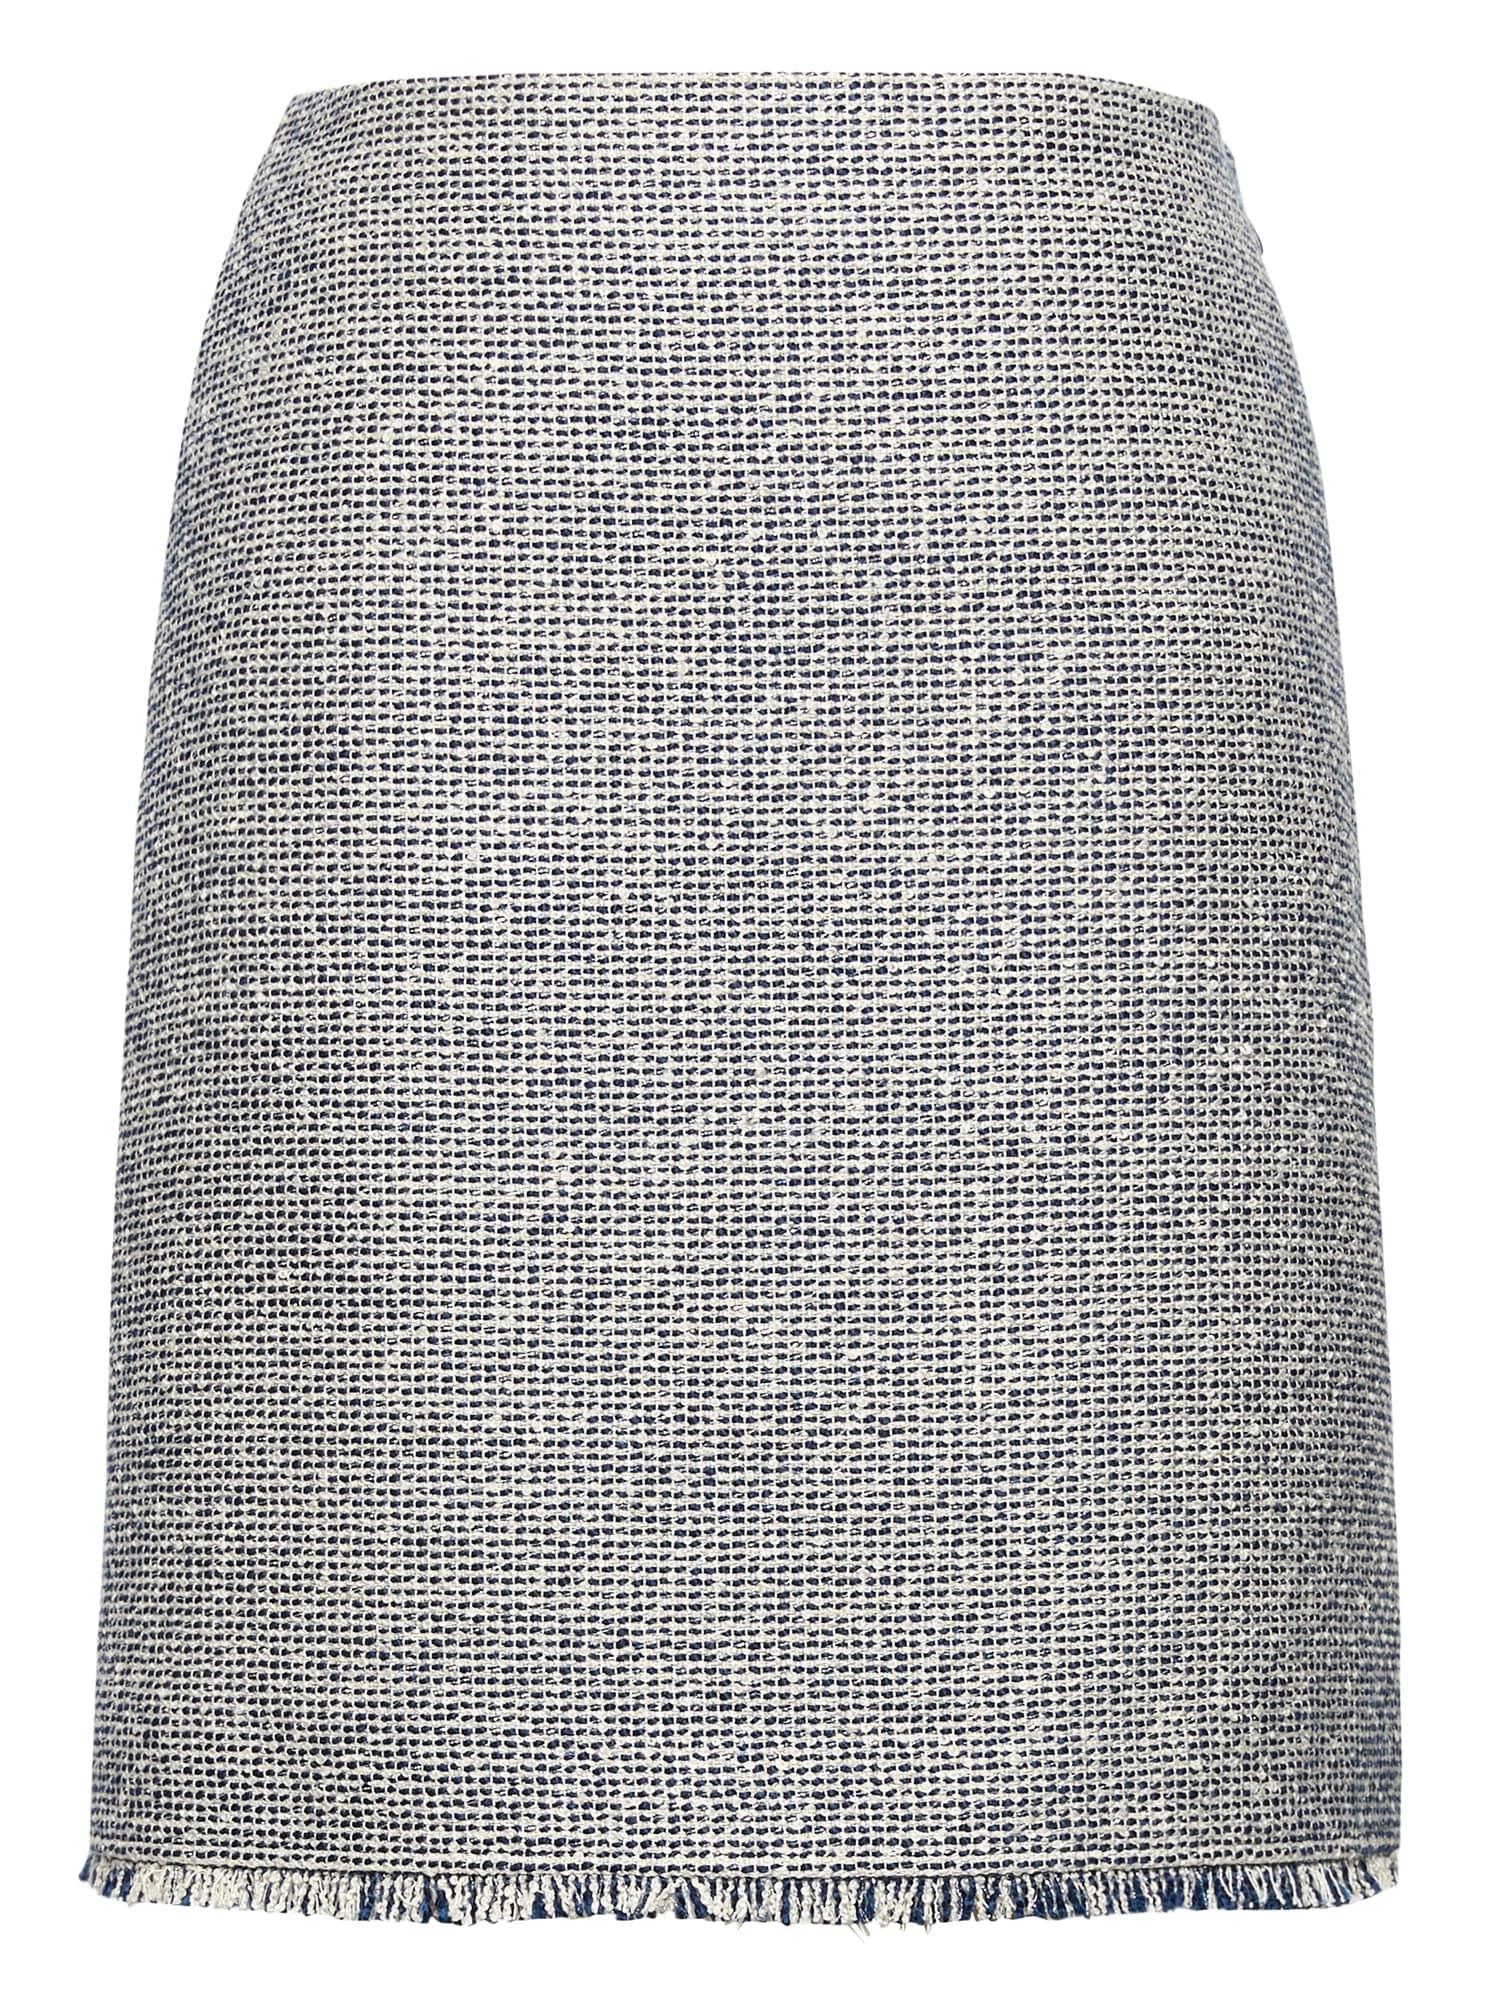 ce90021db5 Banana Republic: Extra 50% OFF Sale Styles - Women's Tweed Mini Skirt  $13.50, Sloan Skinny-Fit Plaid Pant $15 + FS on orders $50+